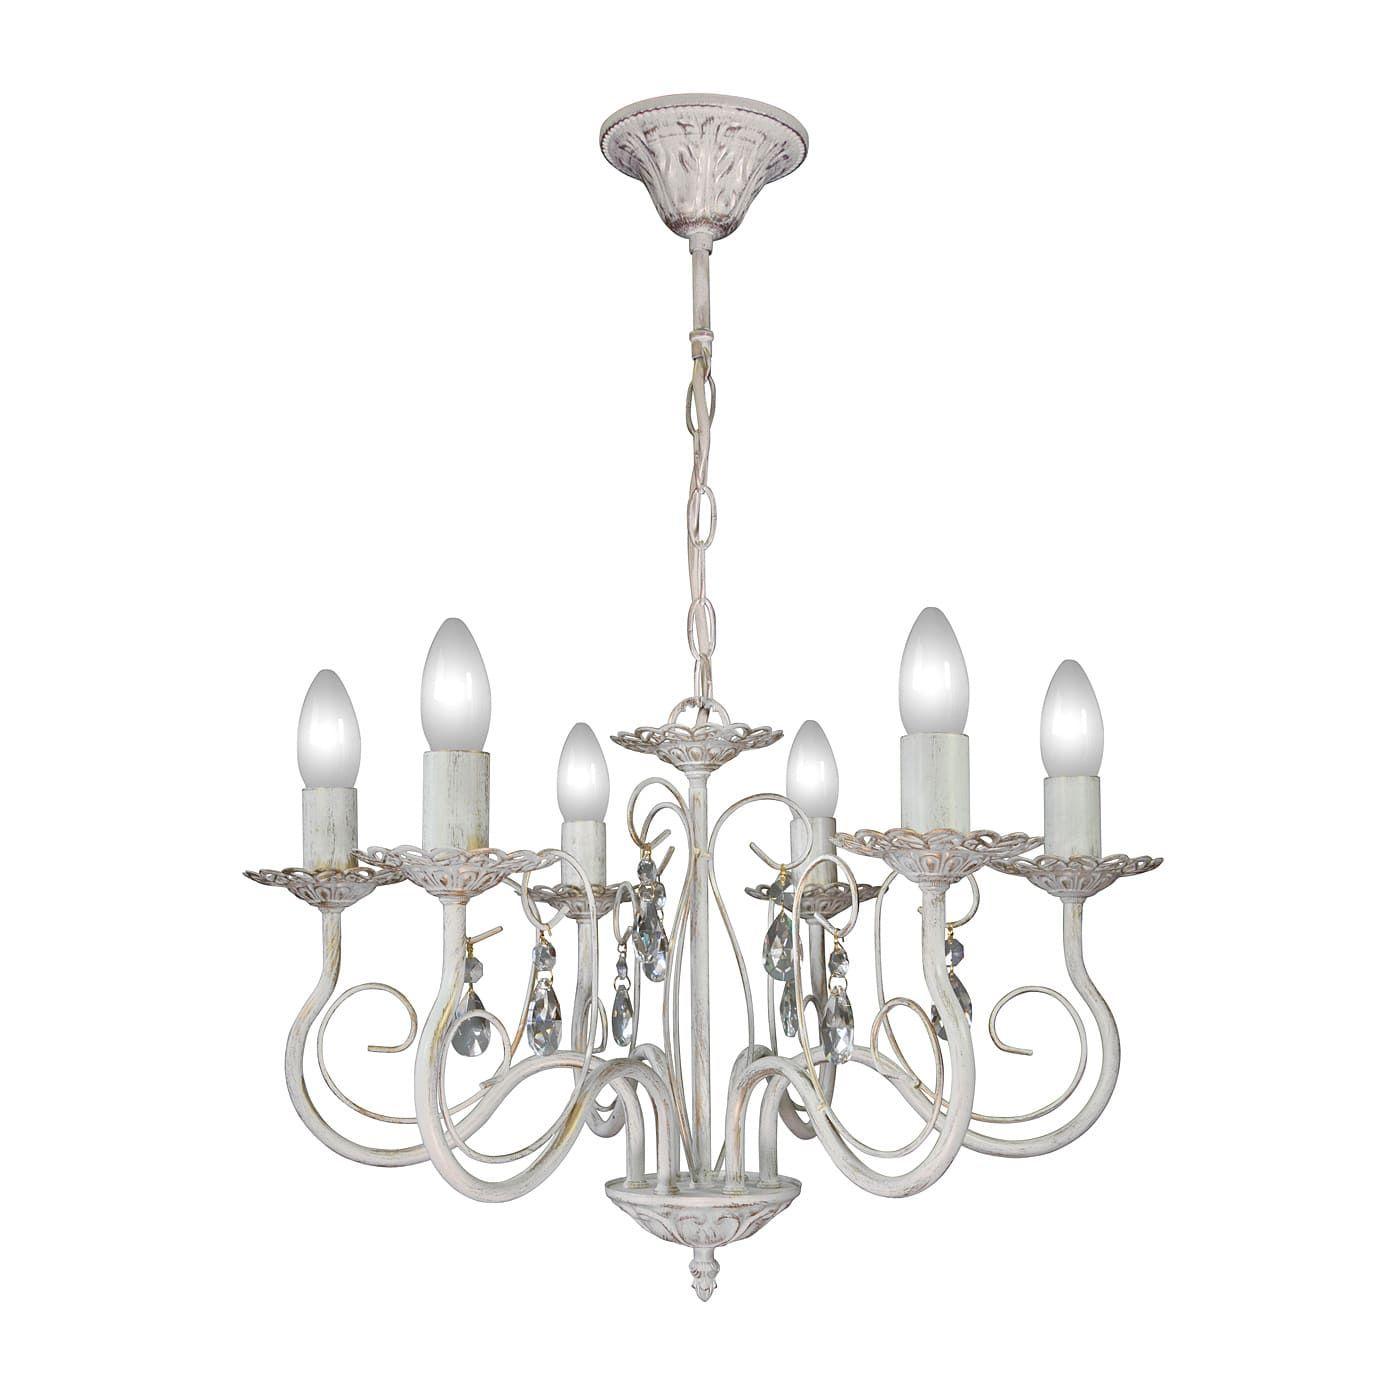 PETRASVET / Pendant chandelier S1035-6, 6xE14 max. 60W